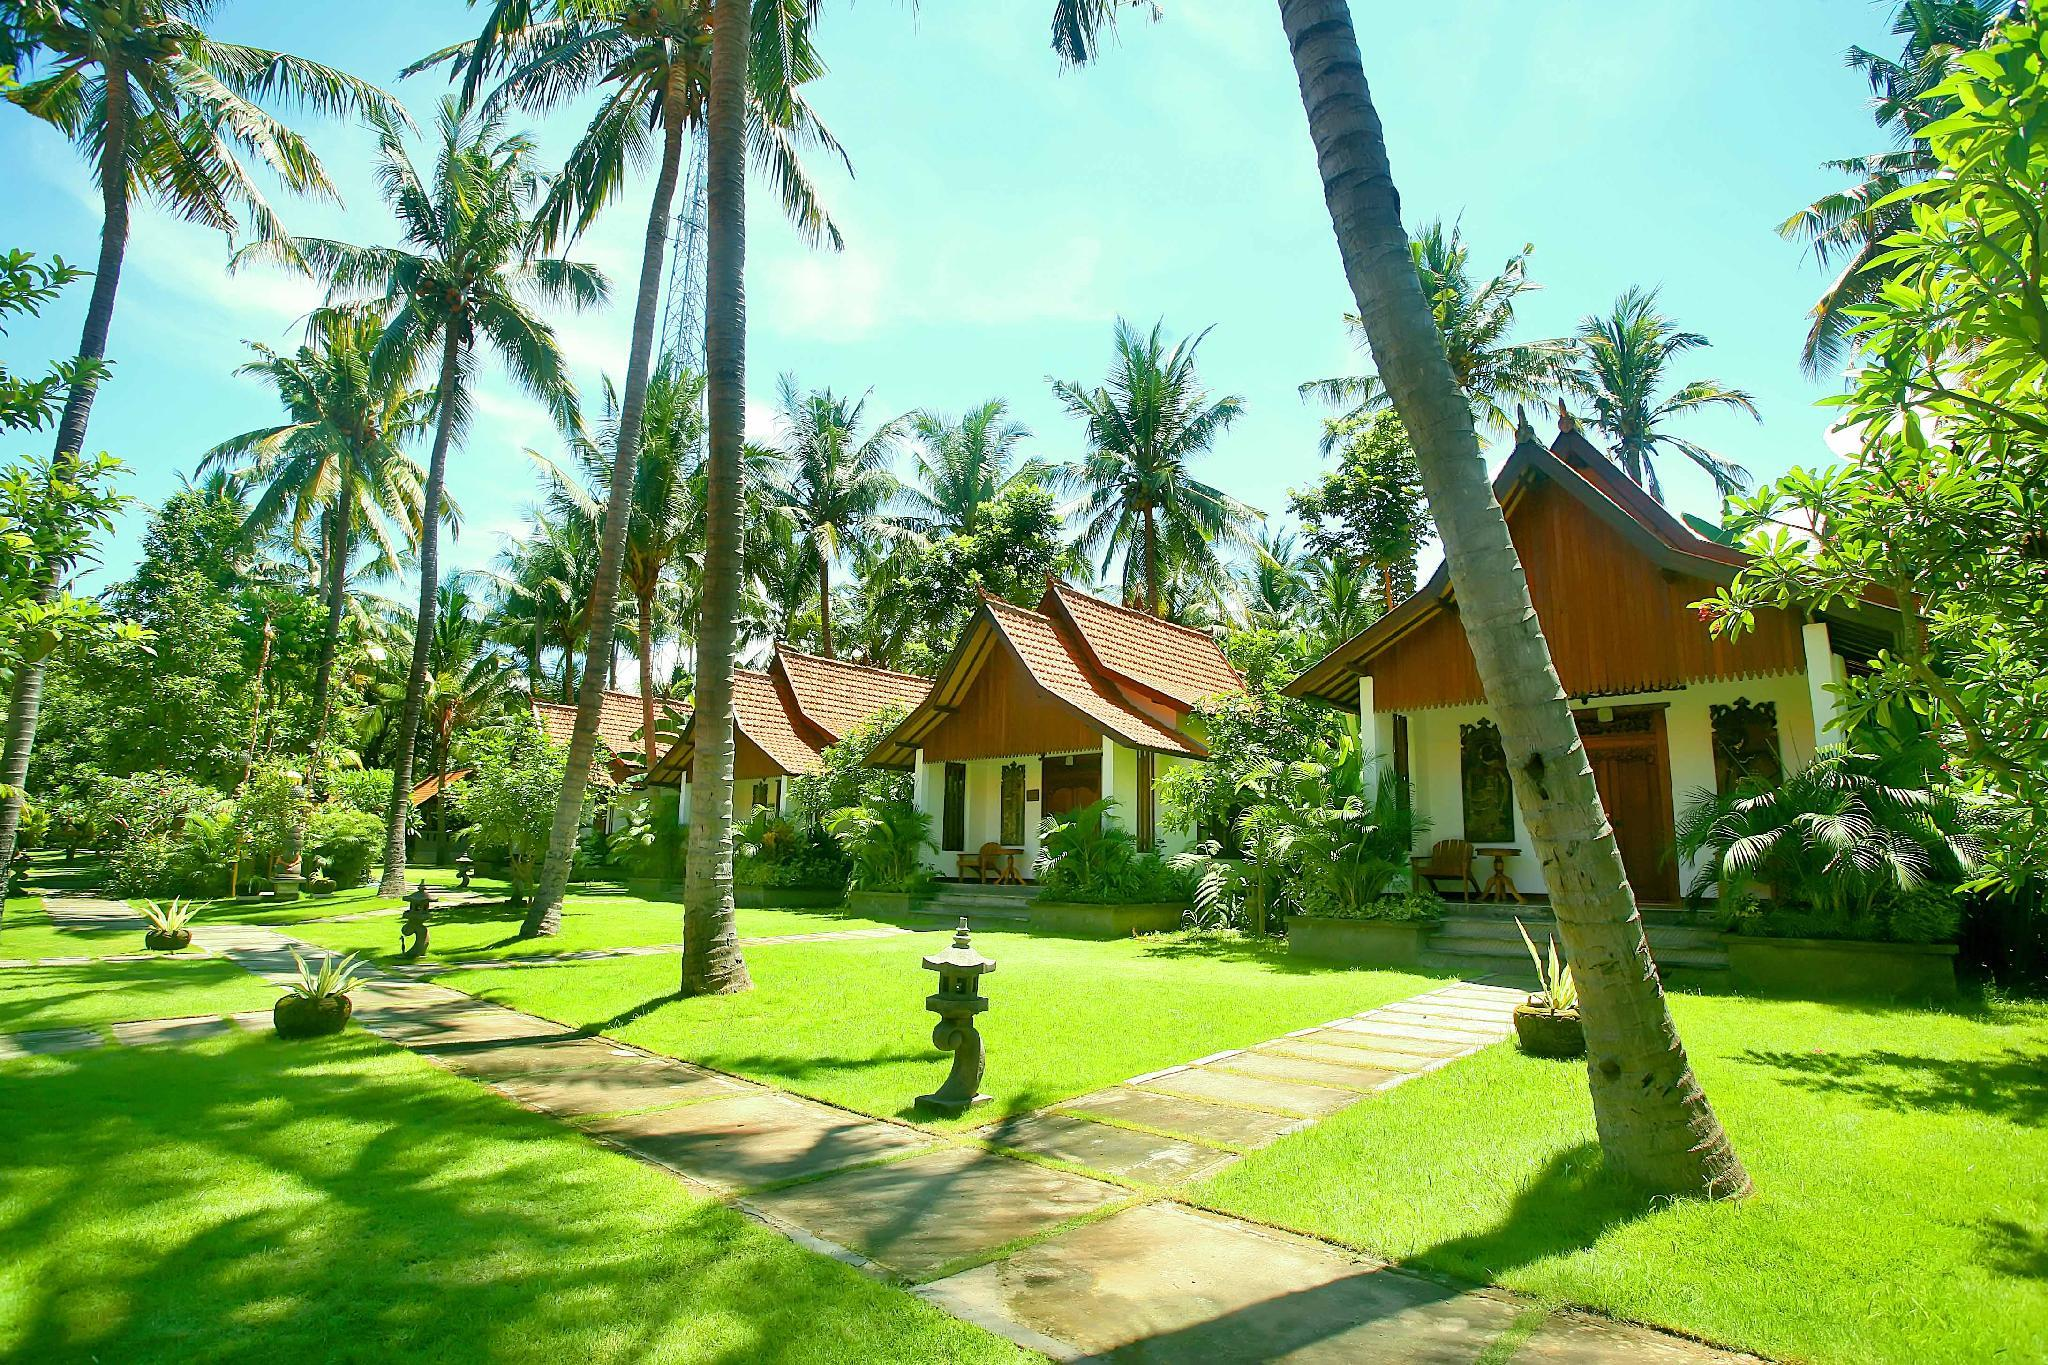 Dewantara Boutique villa Resort by Bali Family Hospitality, Buleleng